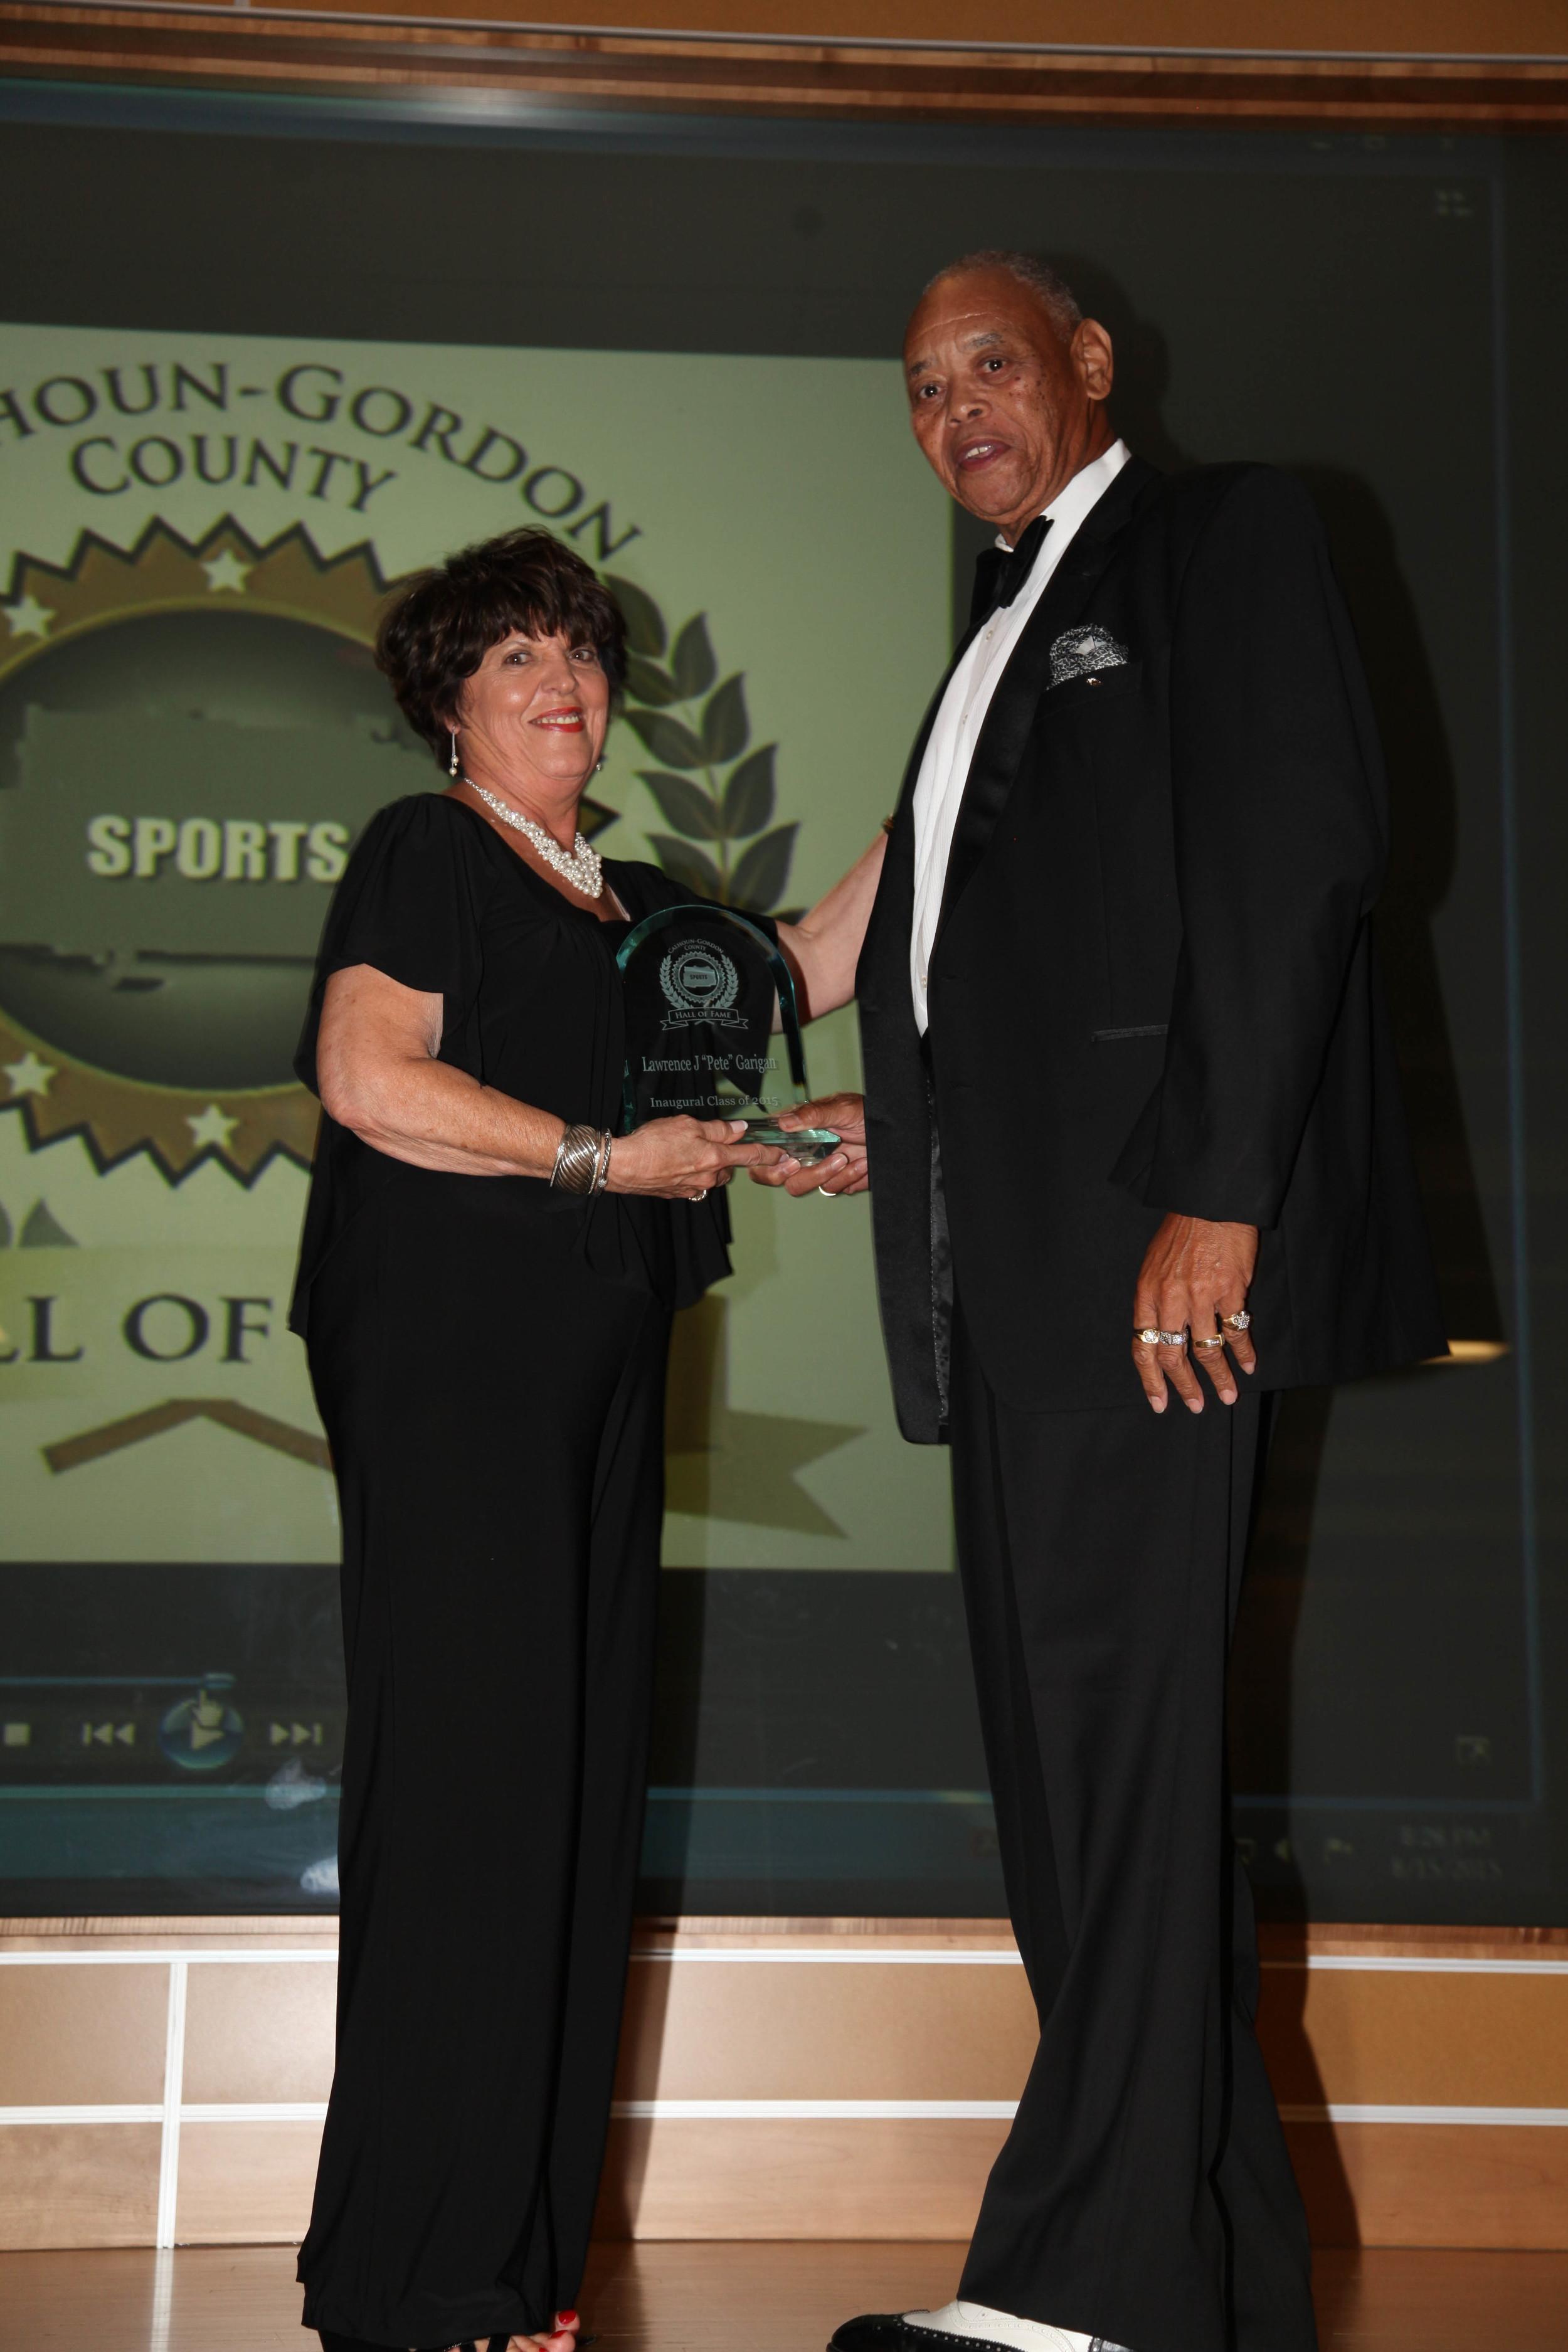 Calhoun-Gordon-County-Sports-Hall-of-Fame-2015-086.jpg